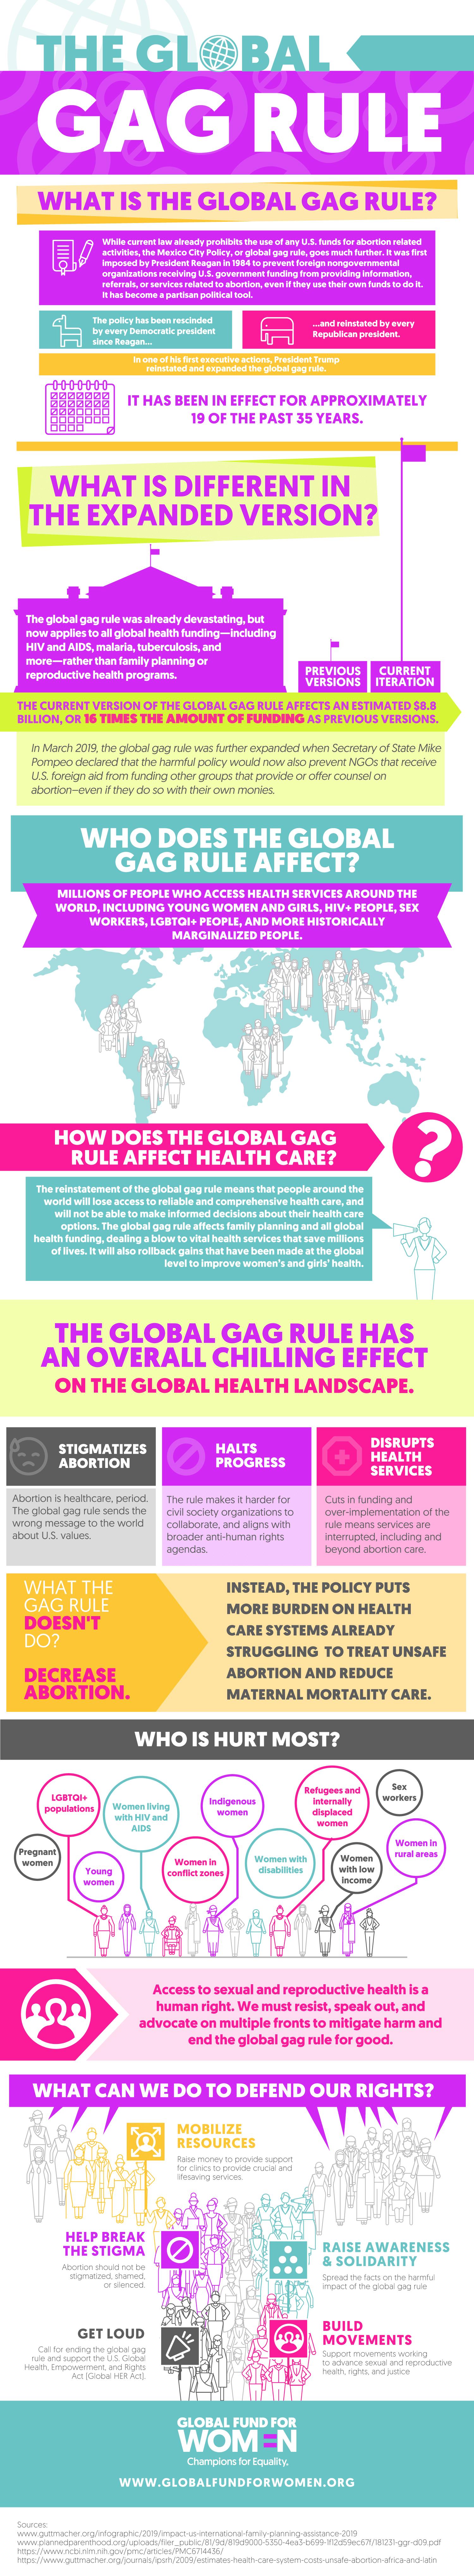 Infographic: Global Gag Rule?